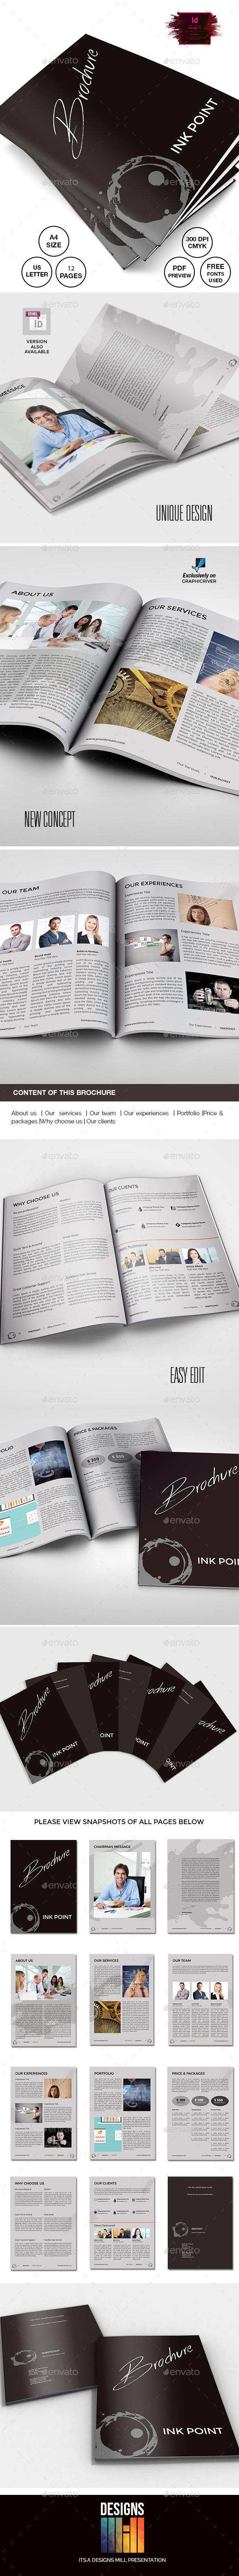 InkPoint Brochure - Informational Brochures